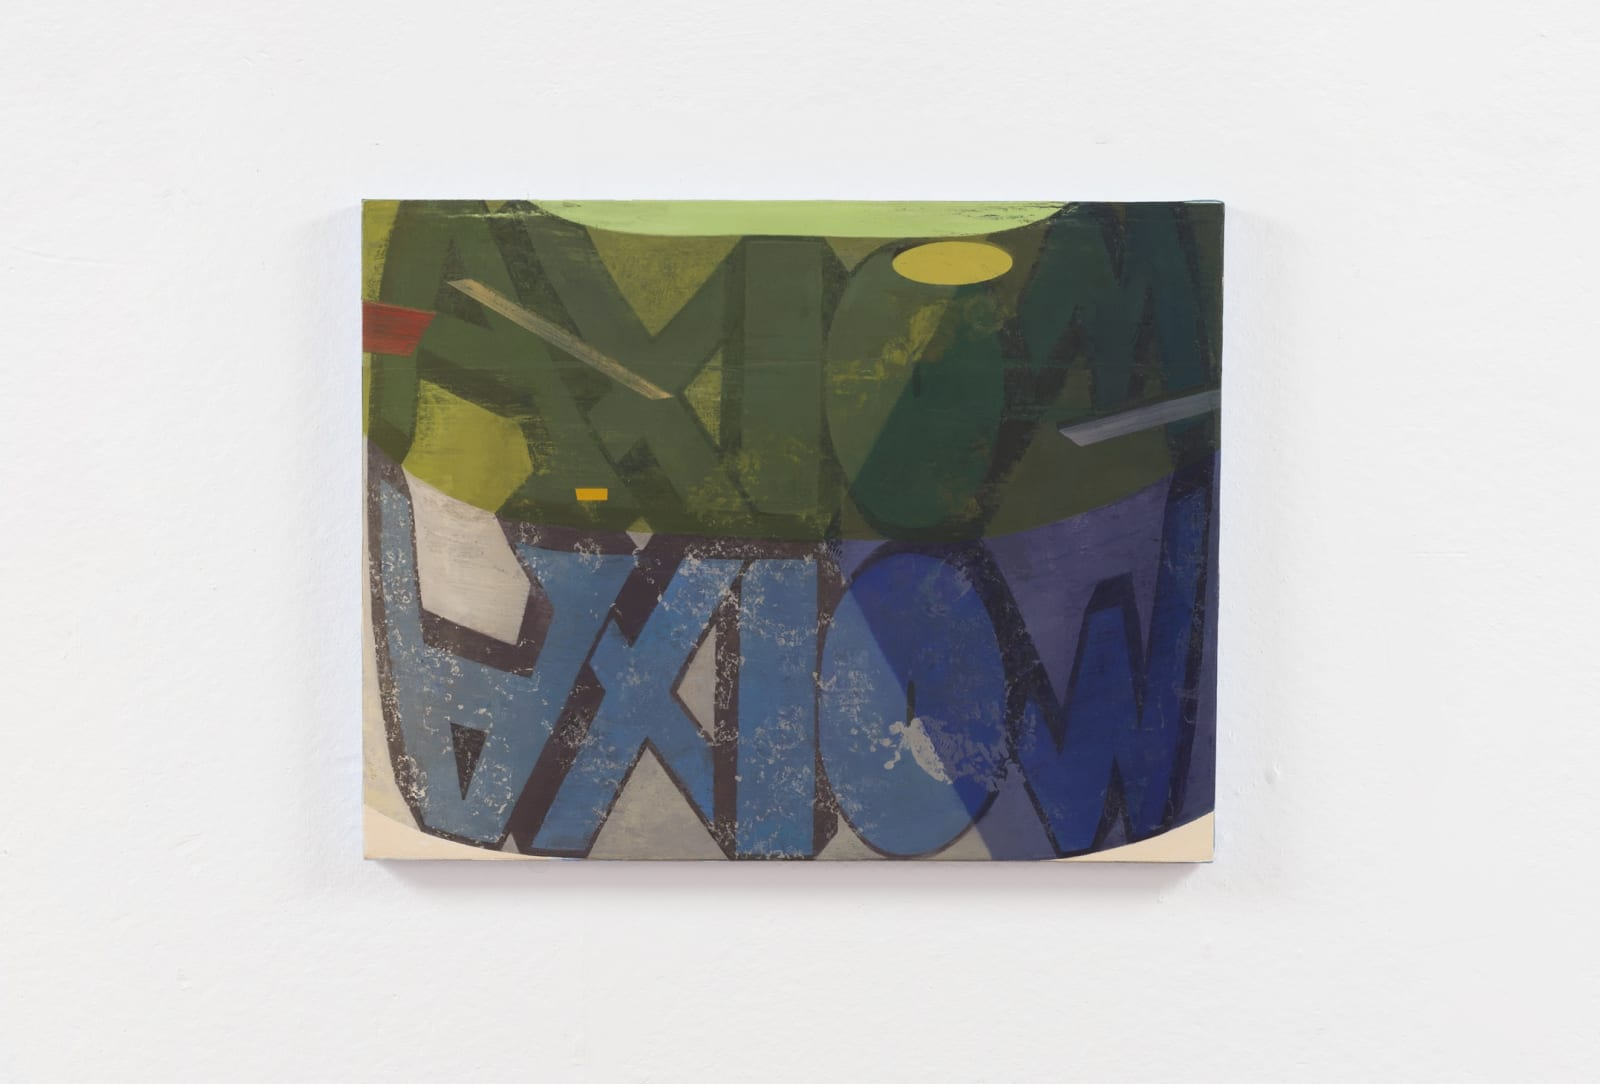 Daniel Dove Moixa, 2019 Oil on canvas 26 x 34 in 66 x 86.4 cm